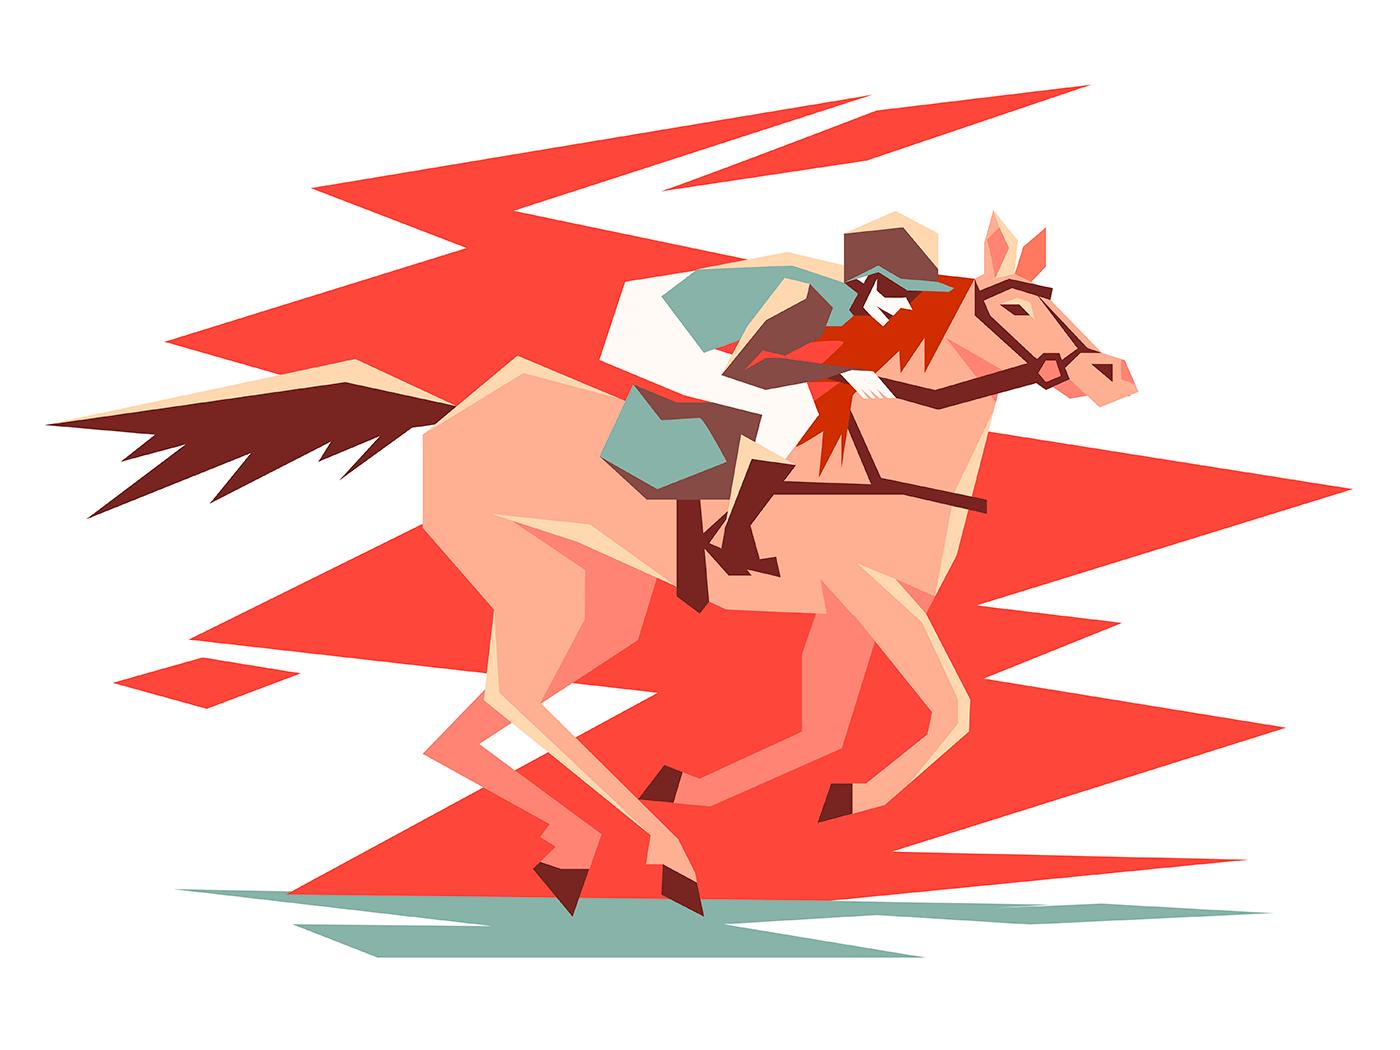 Equestrian horse racing illustration